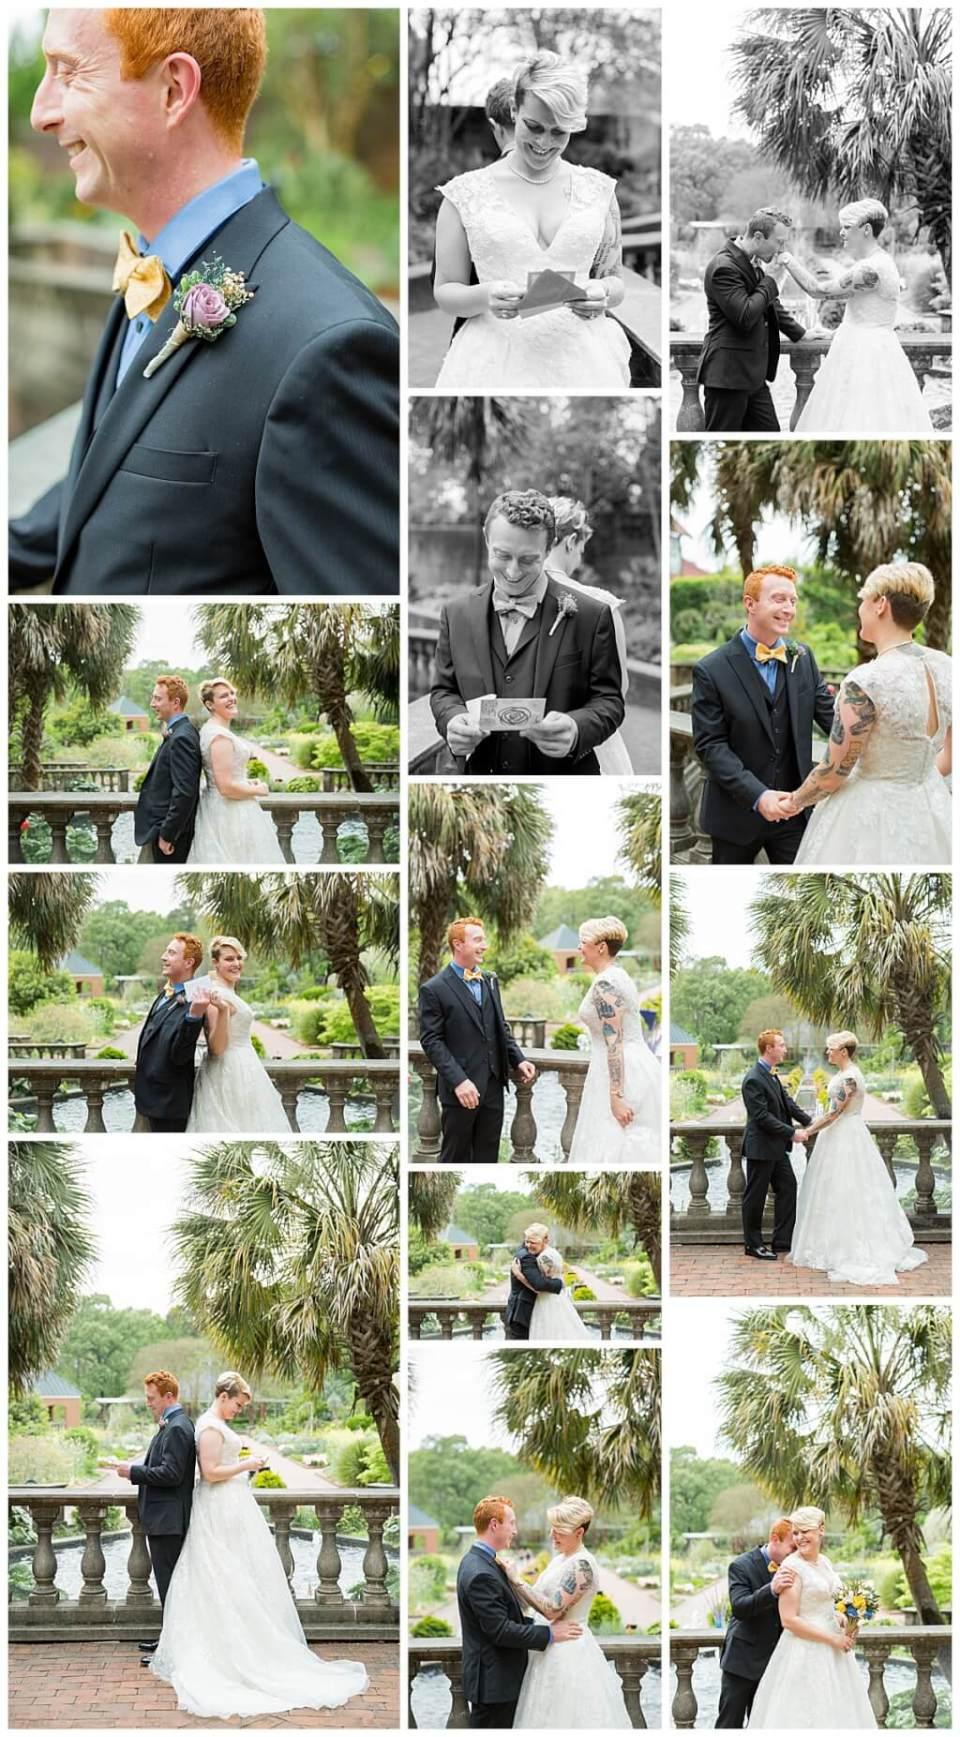 Riverbanks Zoo Botanical Garden LGBTQ Friendly Wedding First Look